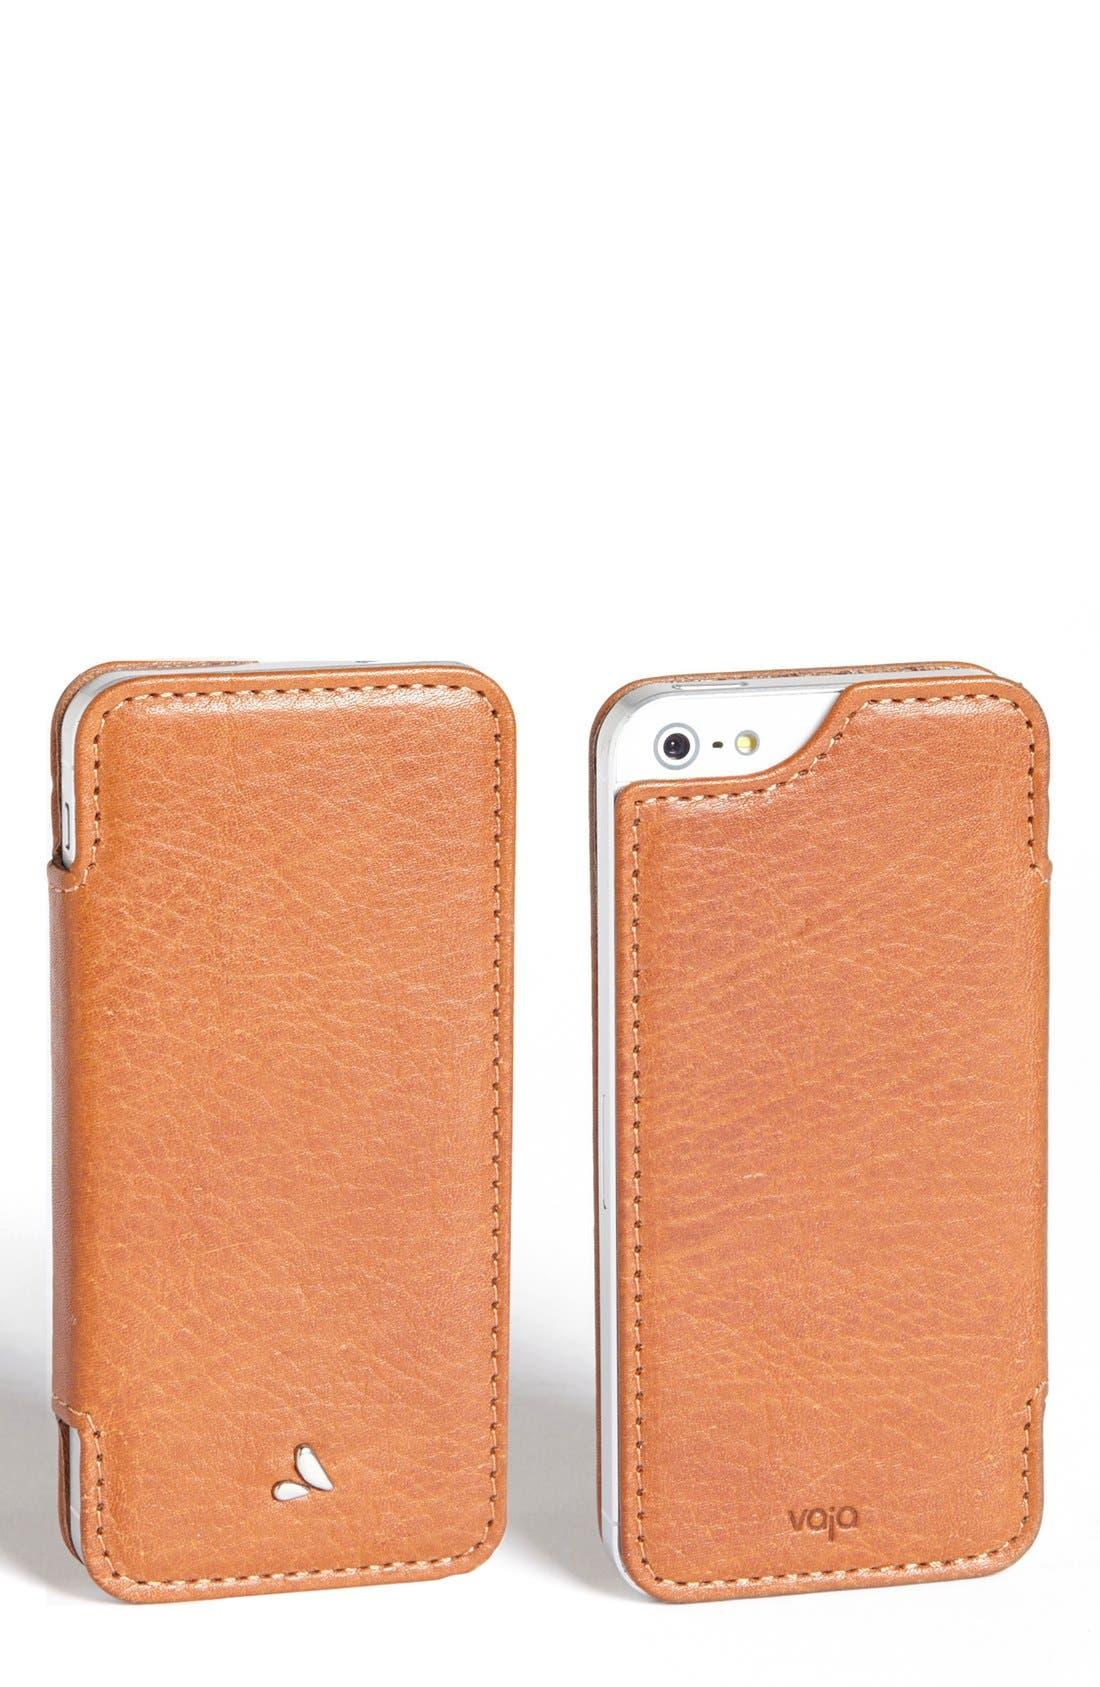 Main Image - Vaja iPhone 5 & 5s Case